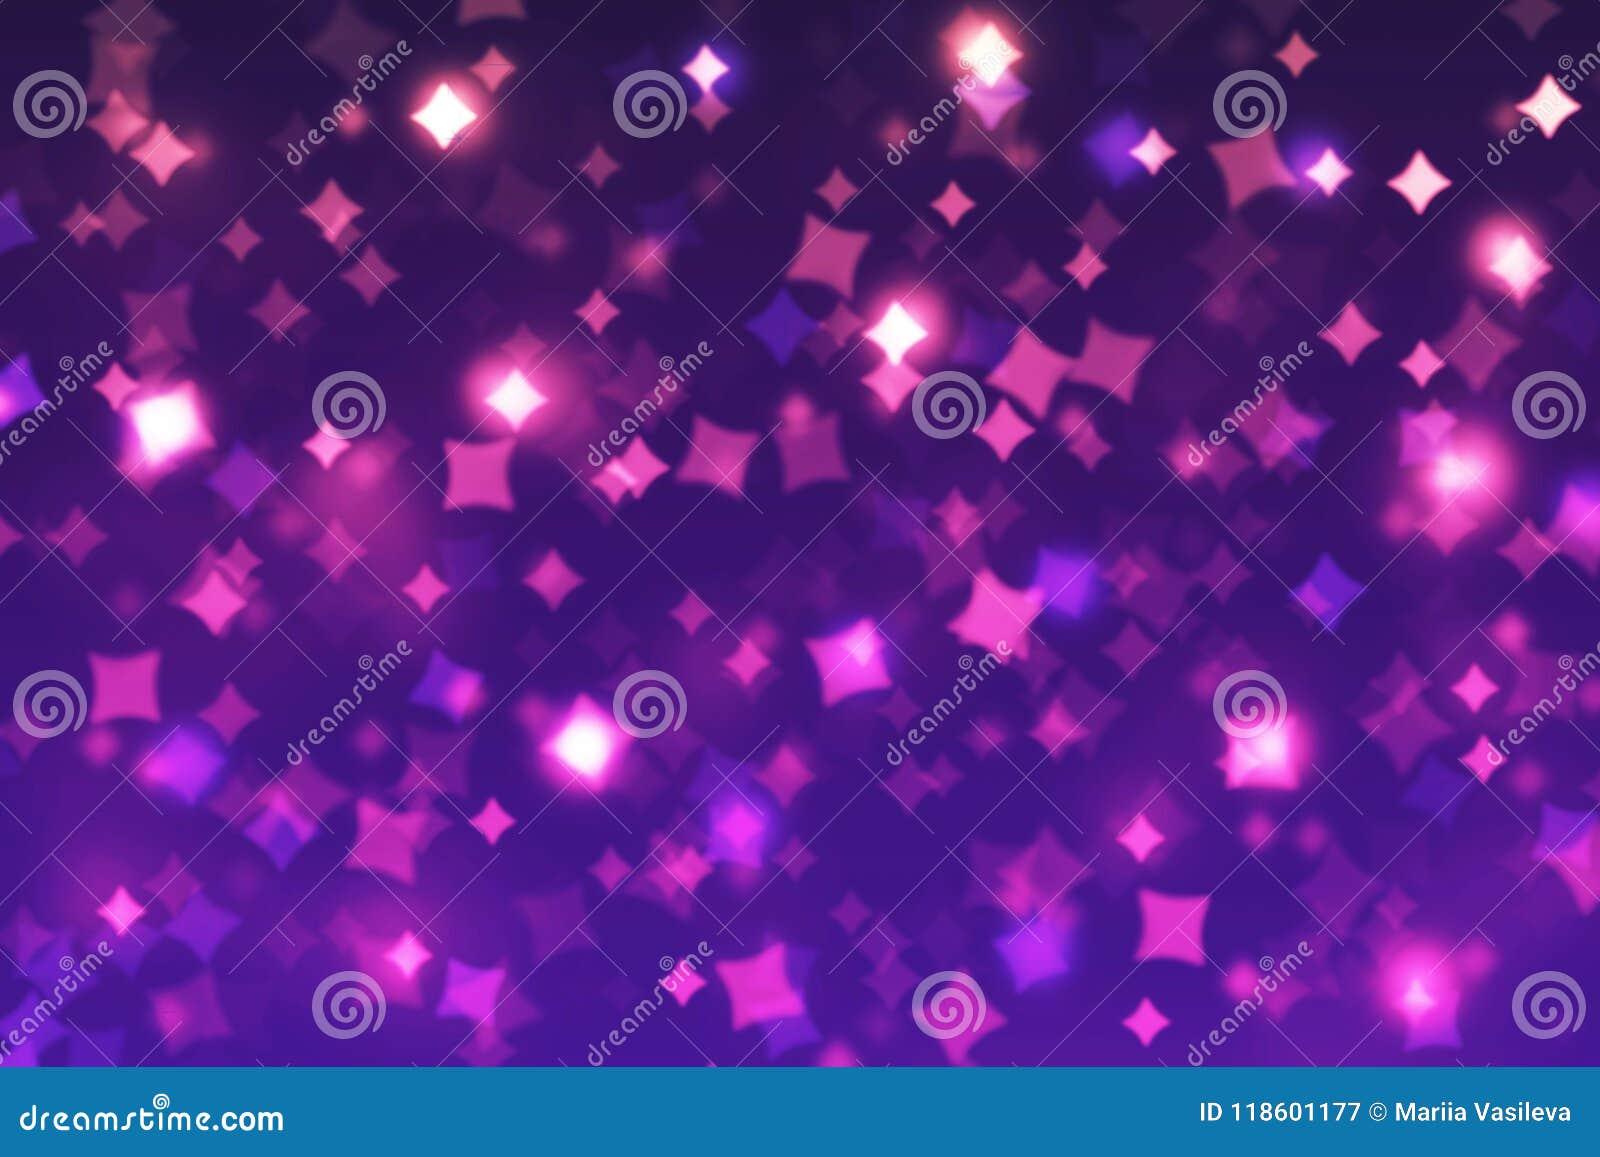 Blurred bokeh background rhombuses blue,purple,pink,black, birth